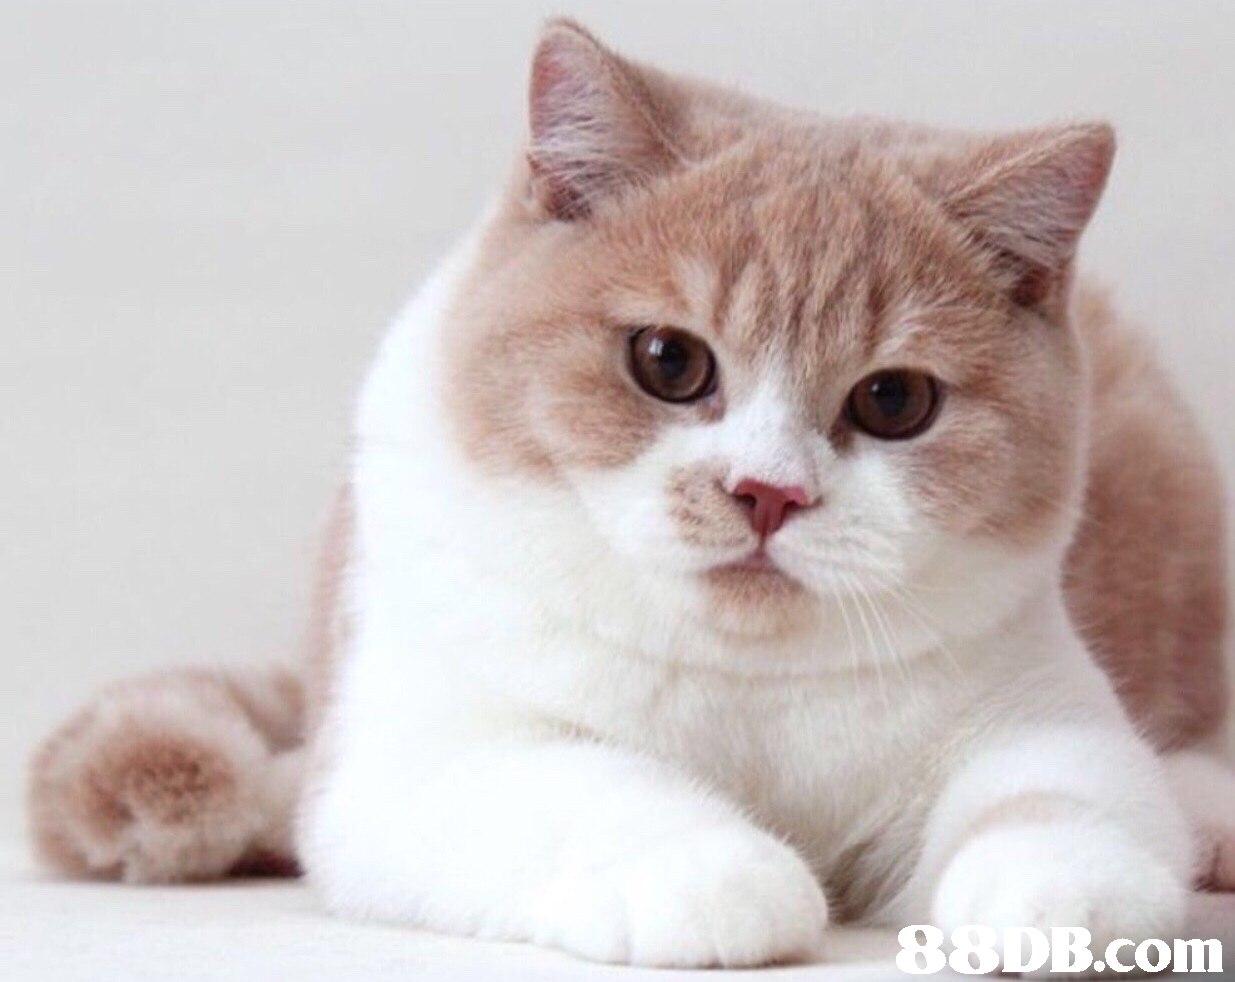 DB.com,cat,small to medium sized cats,mammal,cat like mammal,whiskers